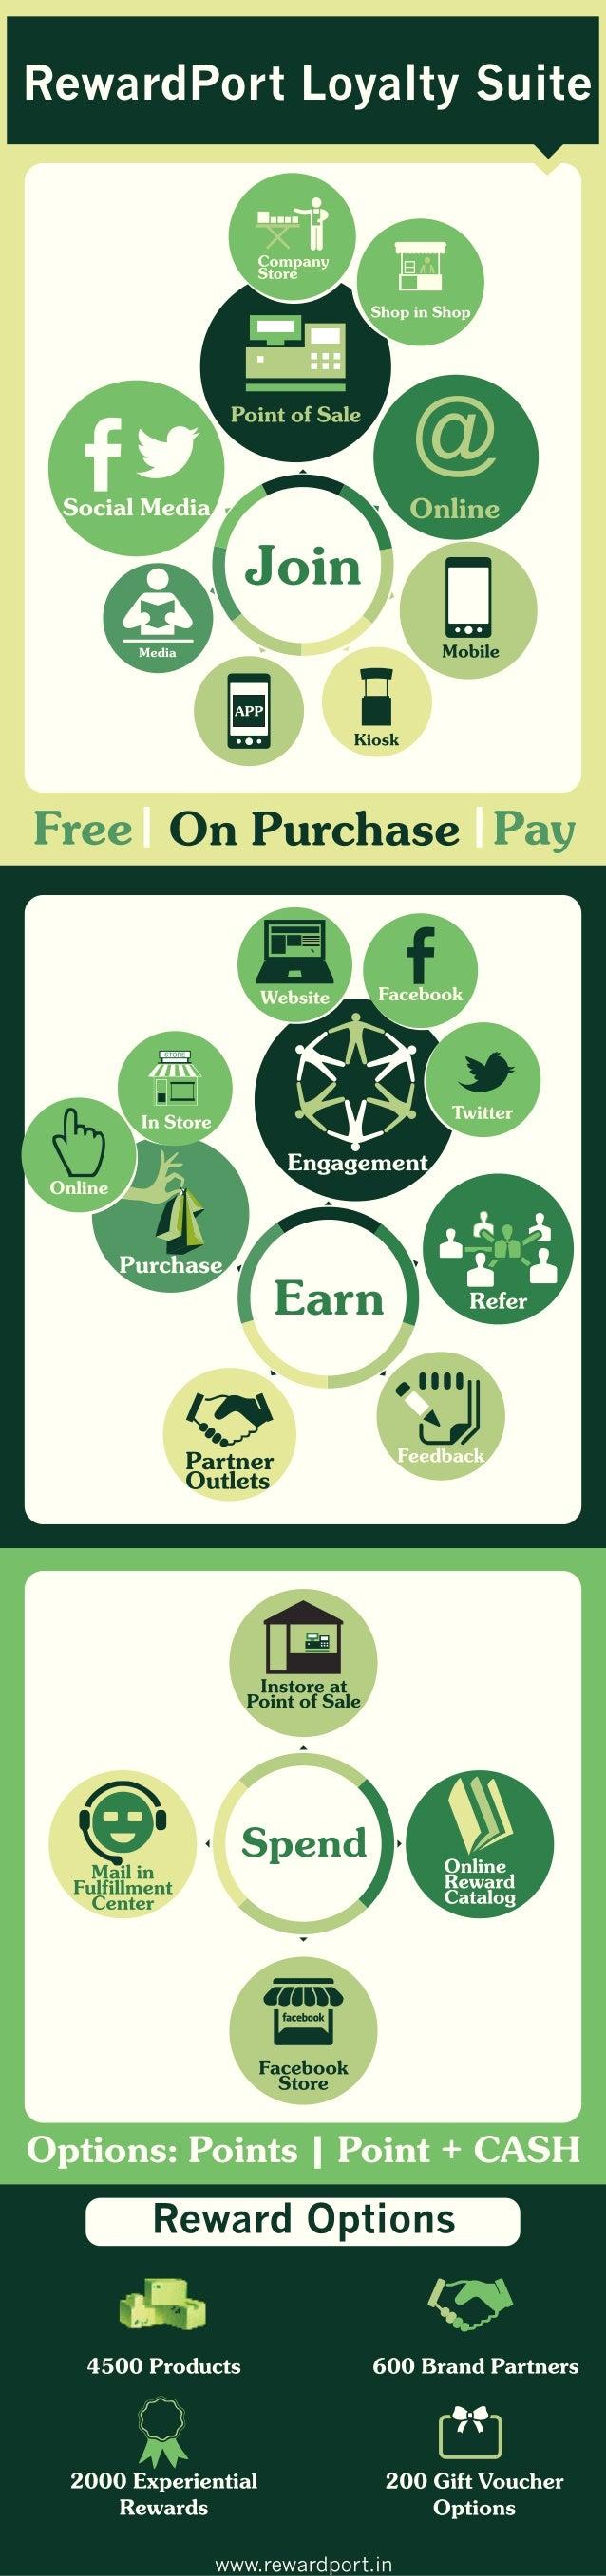 RewardPort Loyalty Suite - Infographic